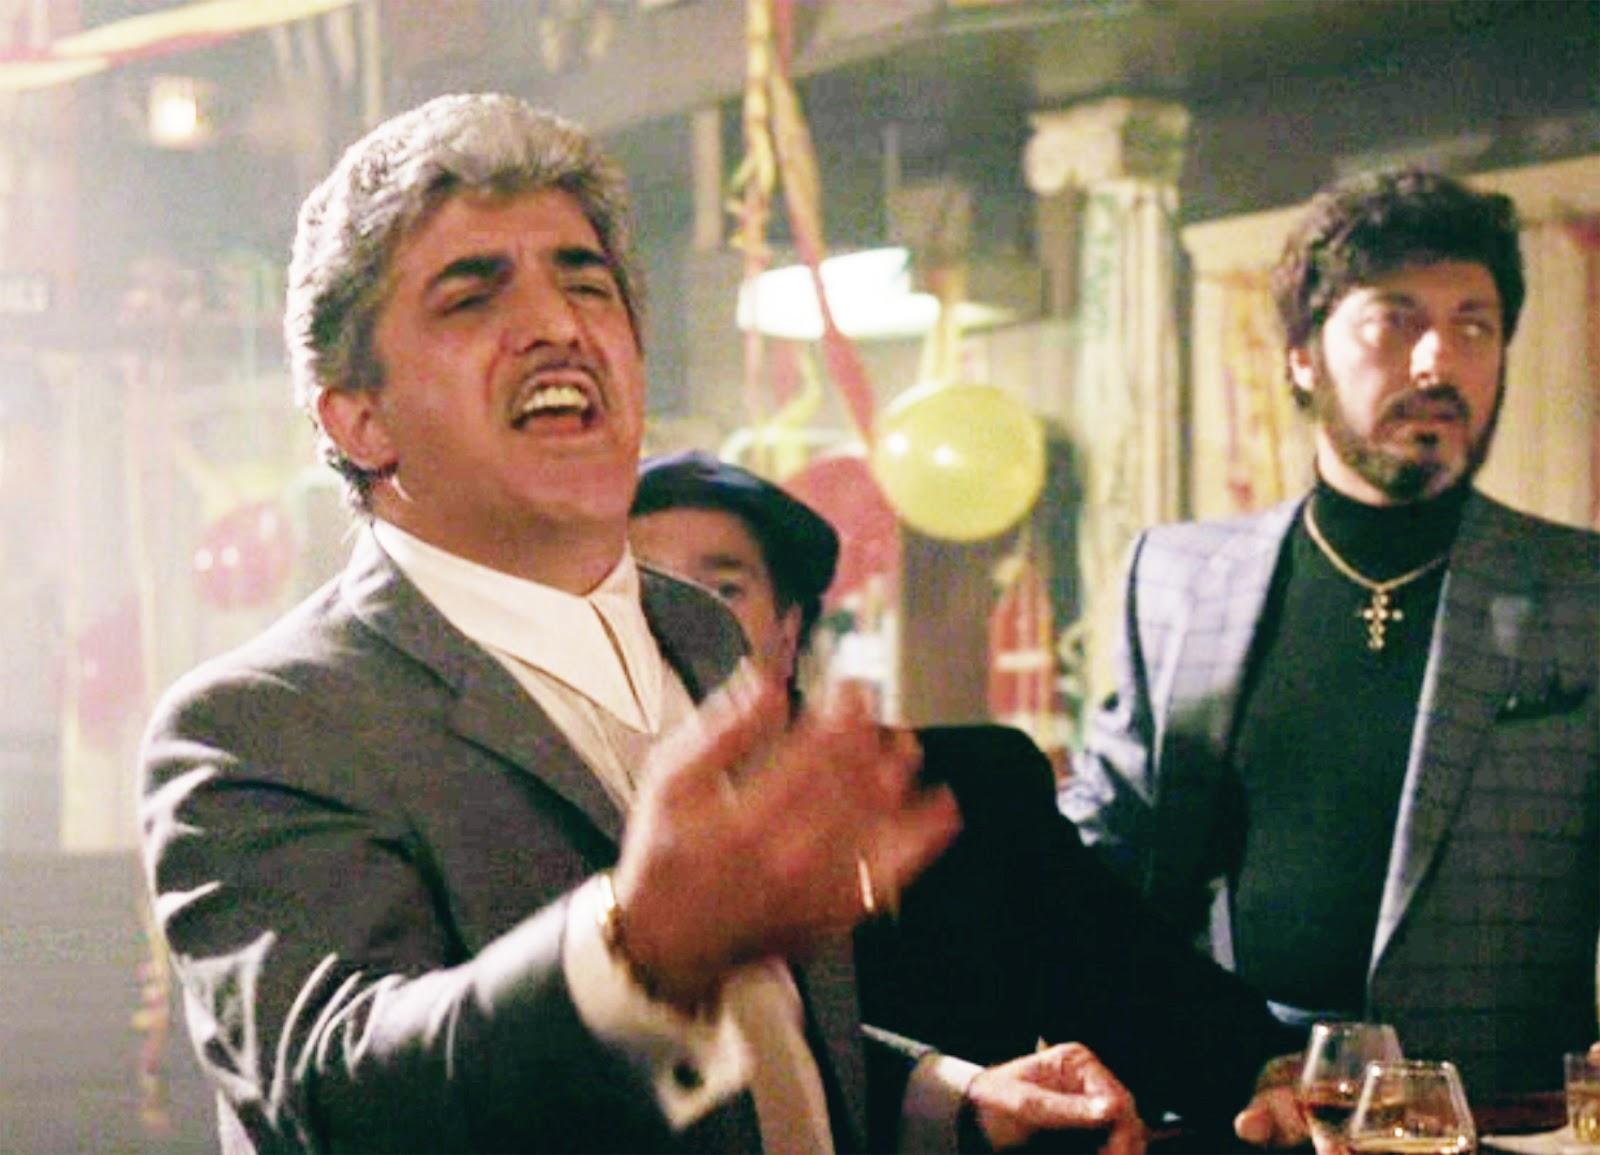 Sopranos and Goodfella...